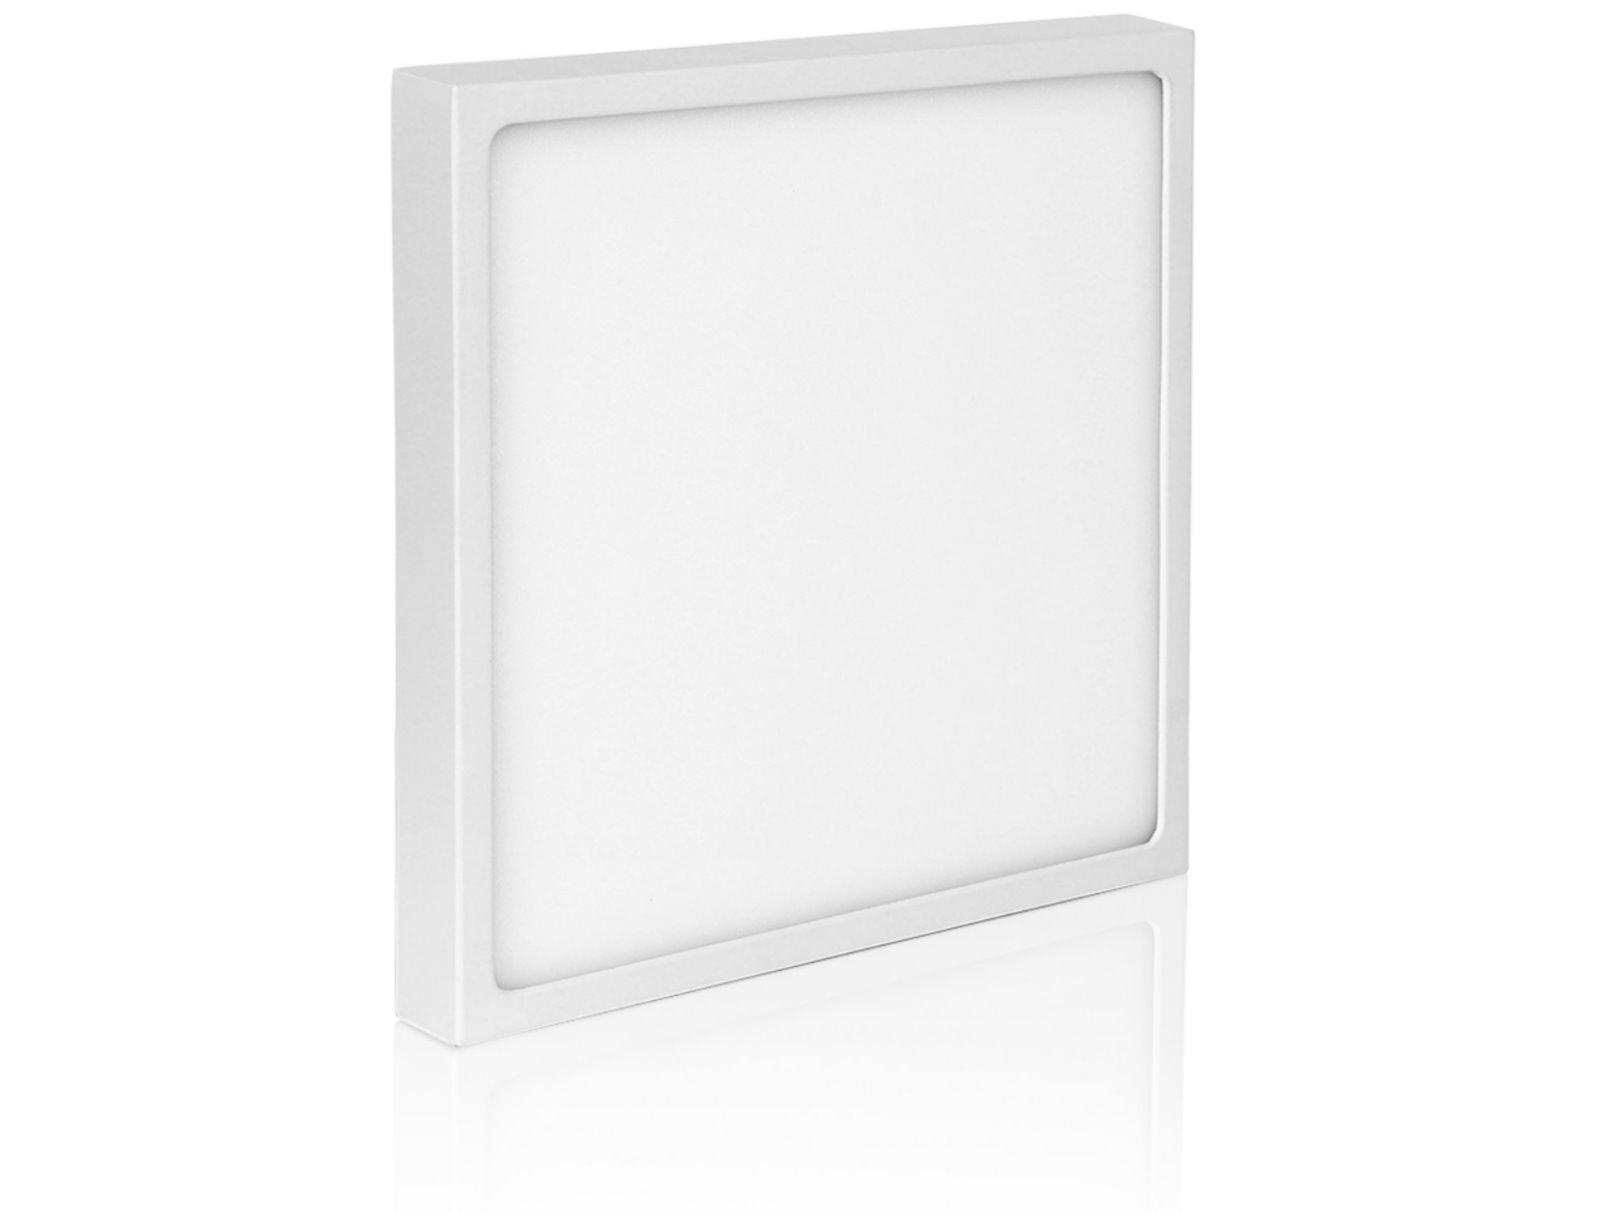 Ultraslim LED Aufbau Panel 230V - Aluminium-Druckguss - 12W Eckig